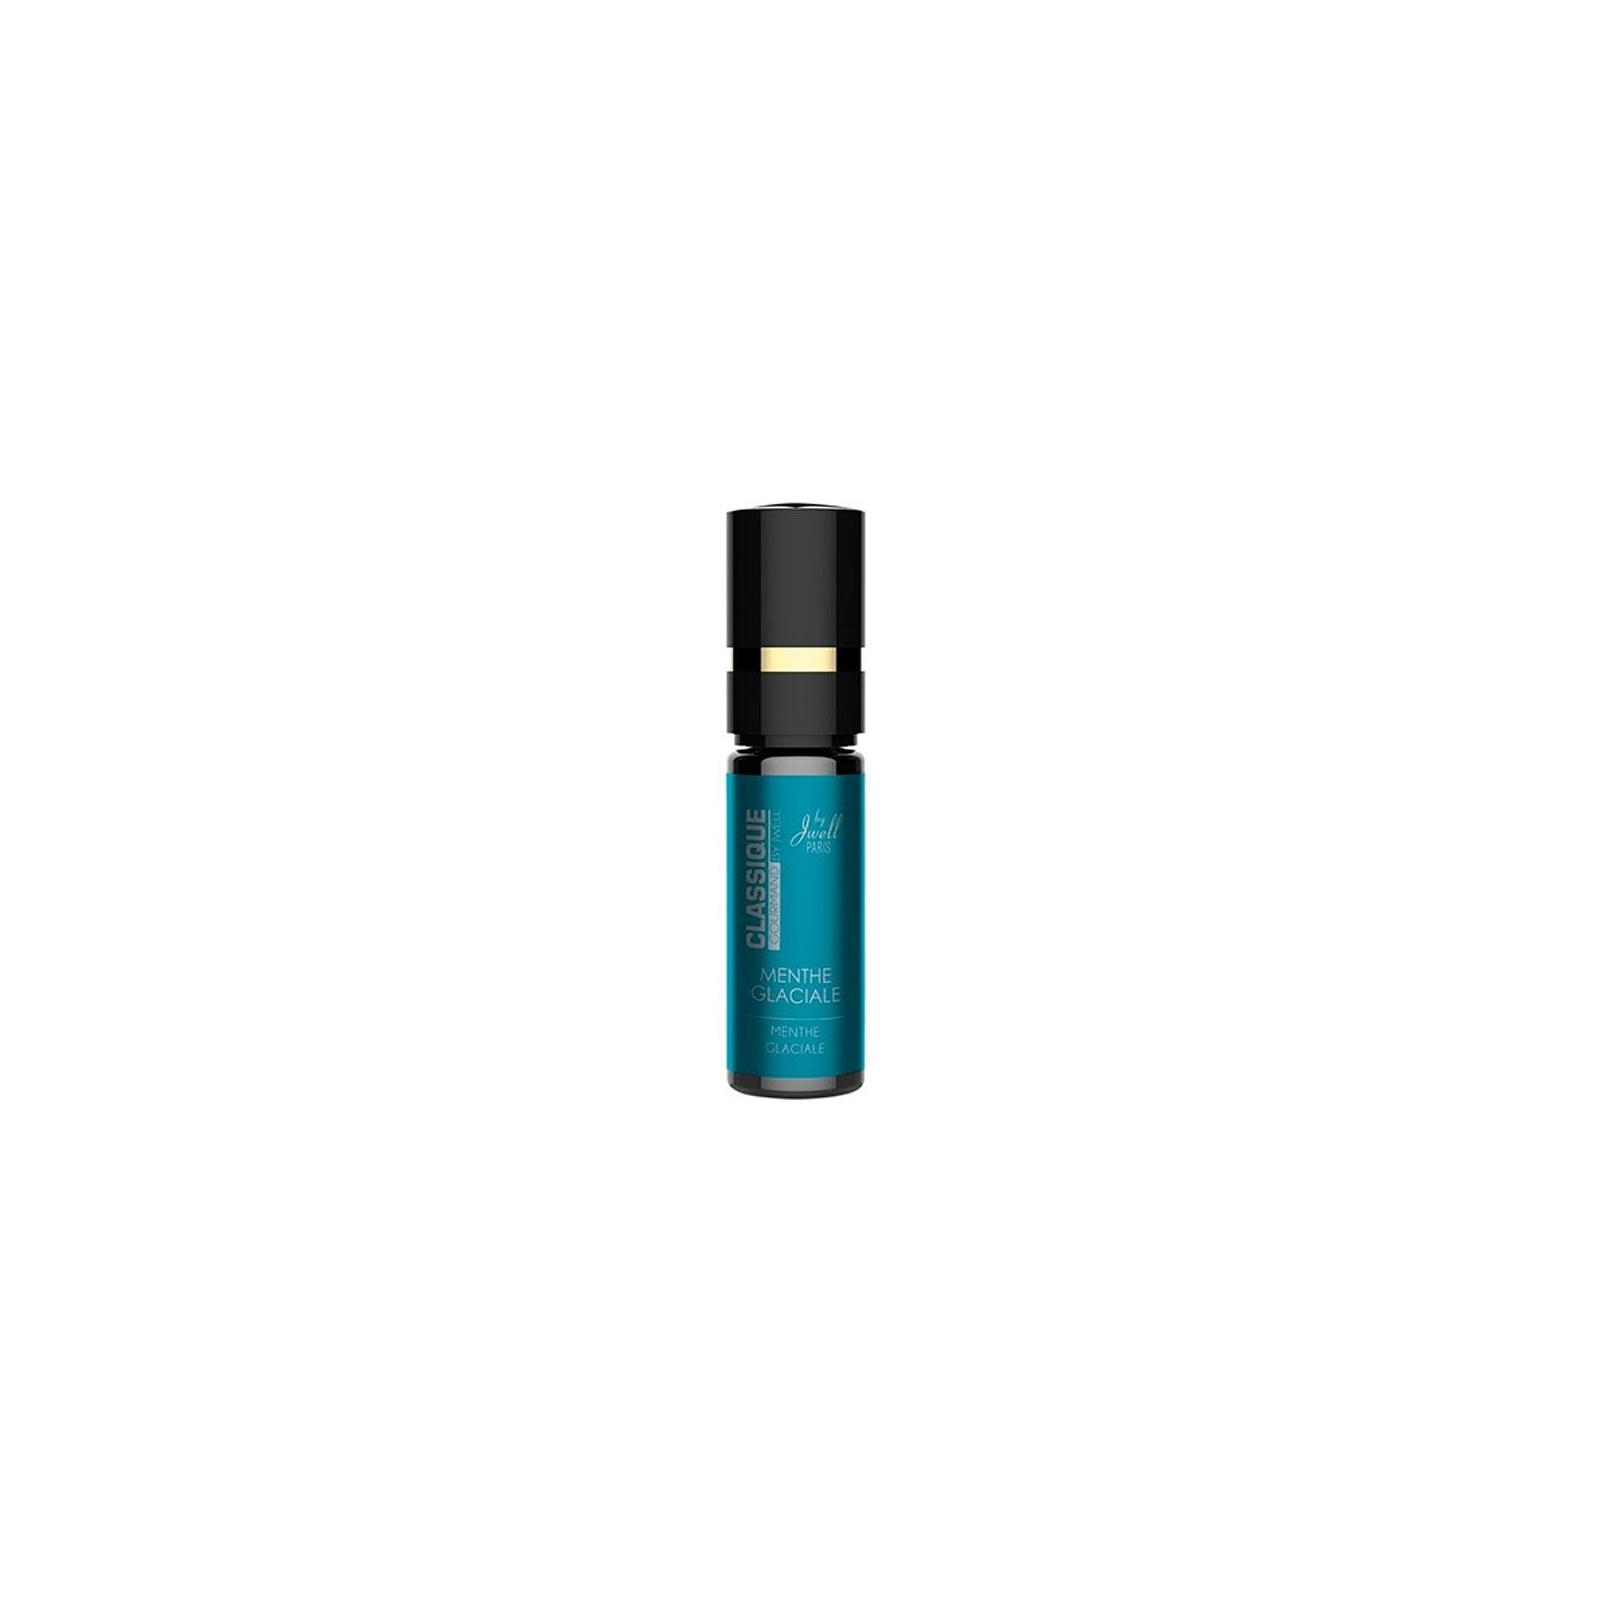 Жидкость для электронных сигарет Jwell Menthe glaciale 10 ml 11 mg (CLGMG1011)